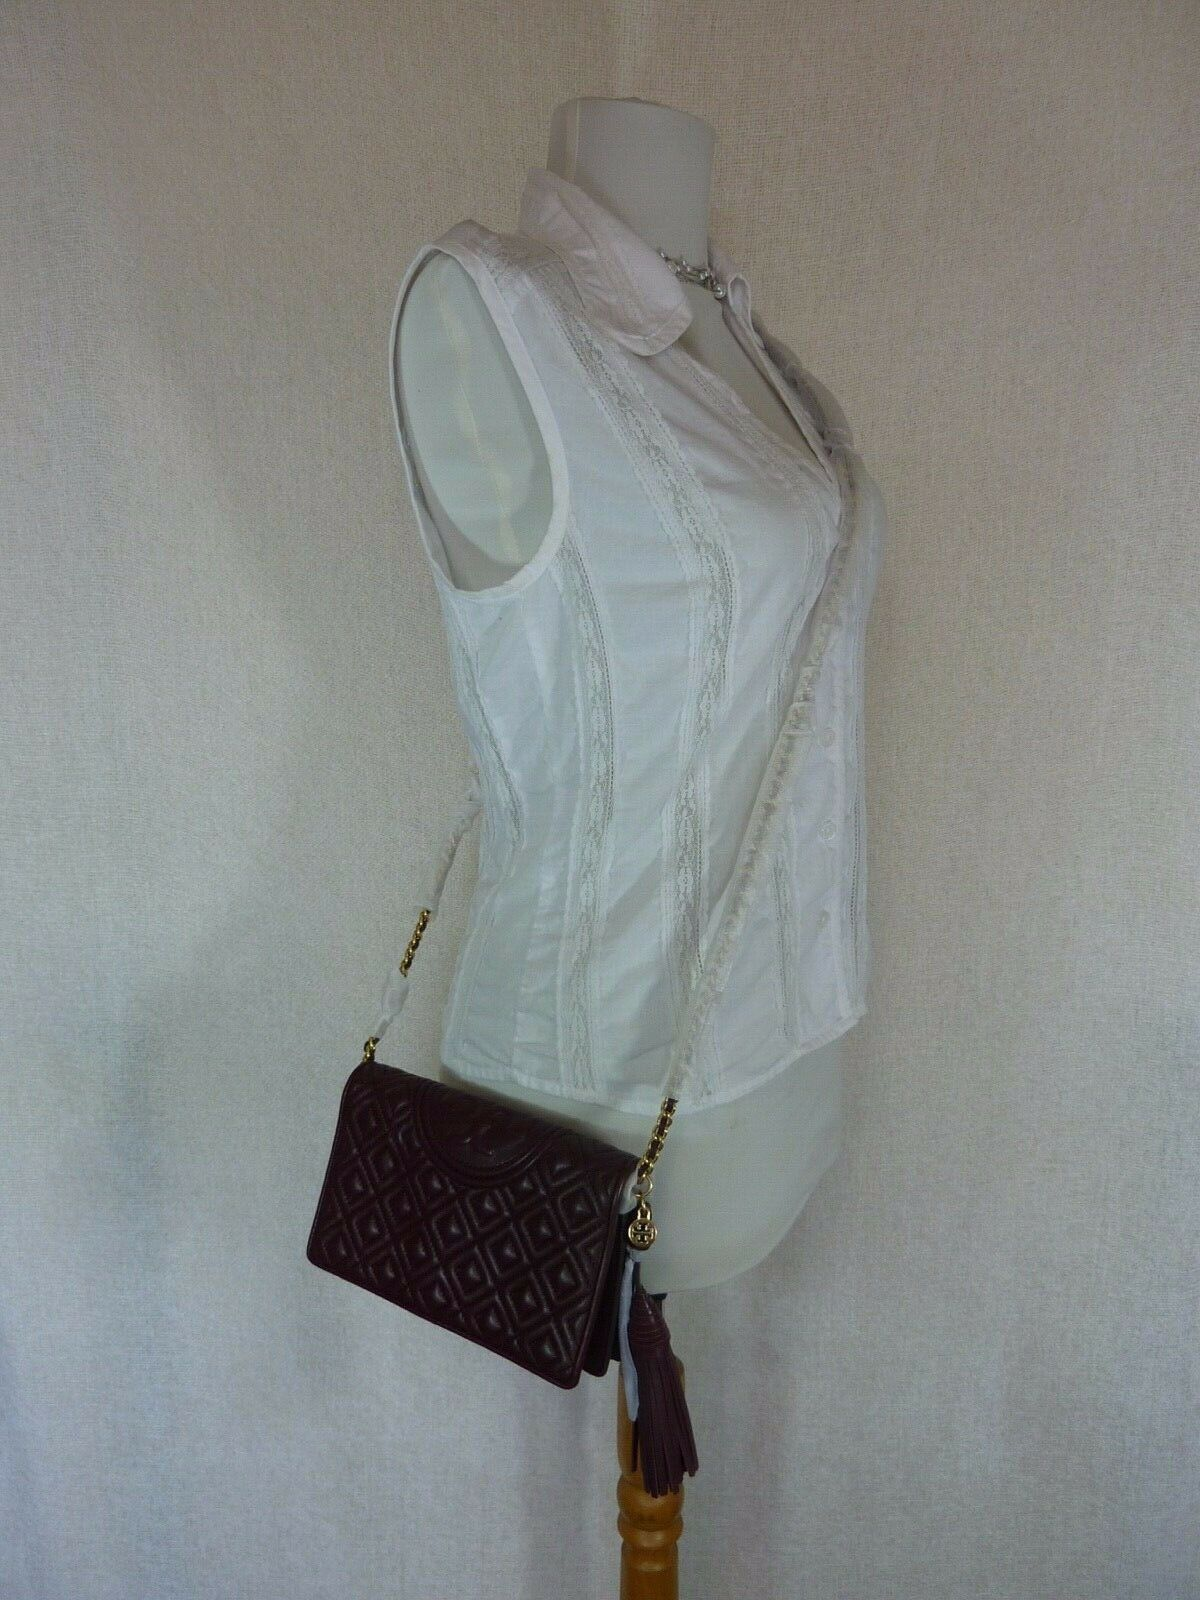 NWT Tory Burch Claret Fleming Wallet Cross Body Bag $328 image 9